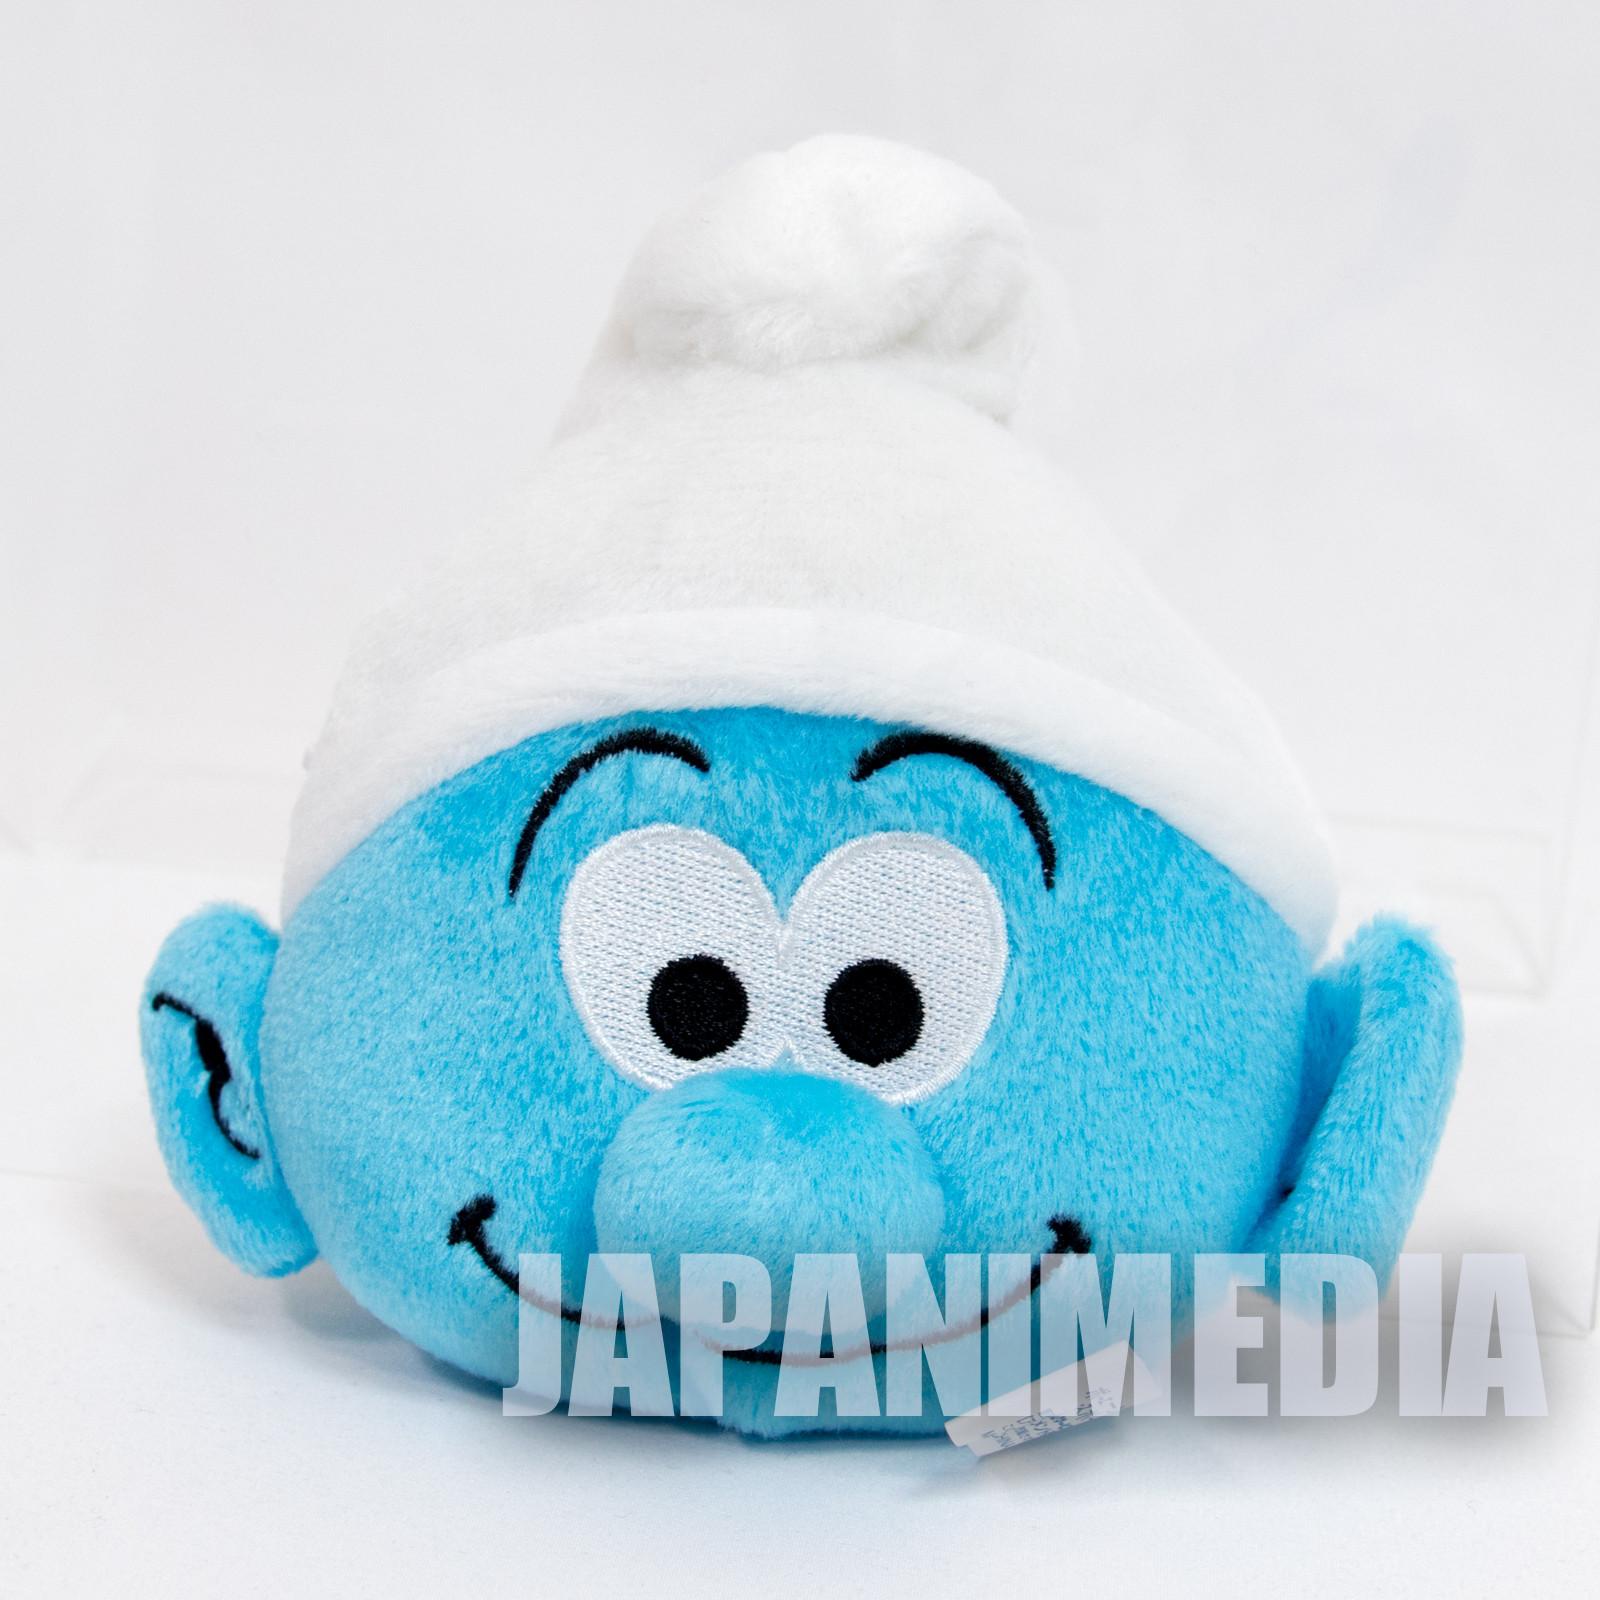 Smurf Face Type Plush Doll Pouch Mini Bag Ballchain JAPAN SMURFS